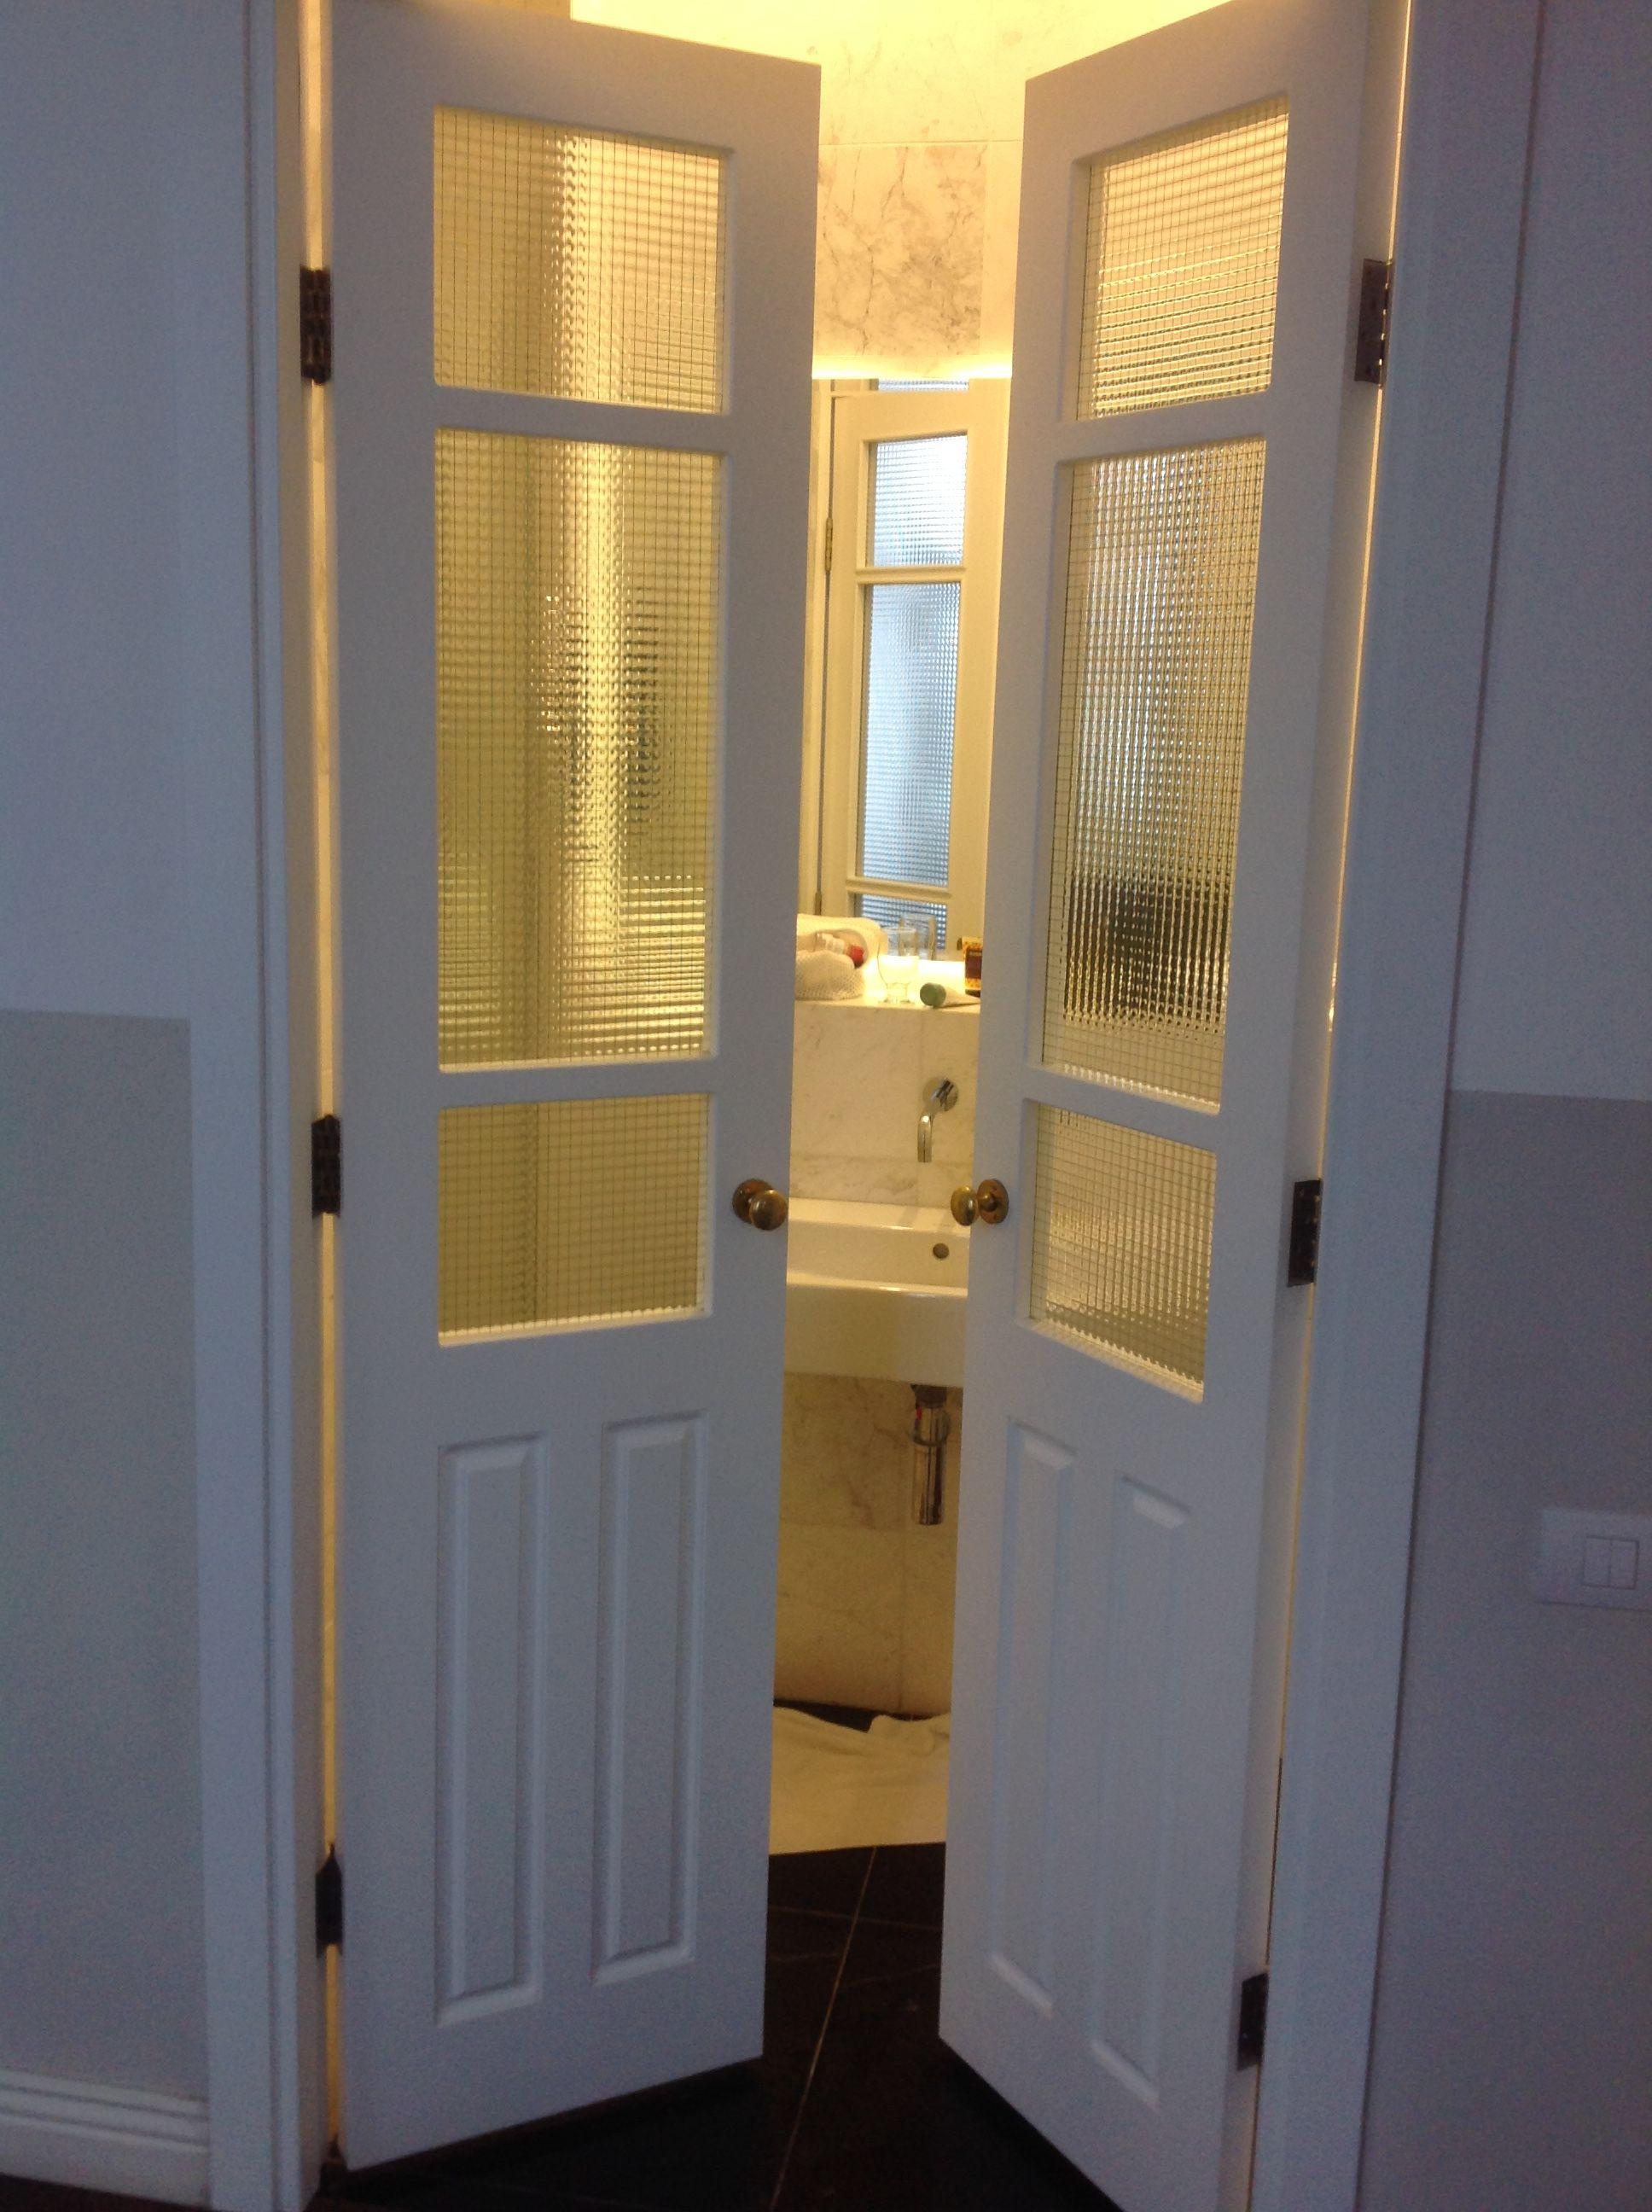 Deco Porte Salle De Bain salledebain #douche #decoration # petitespace | porte salle